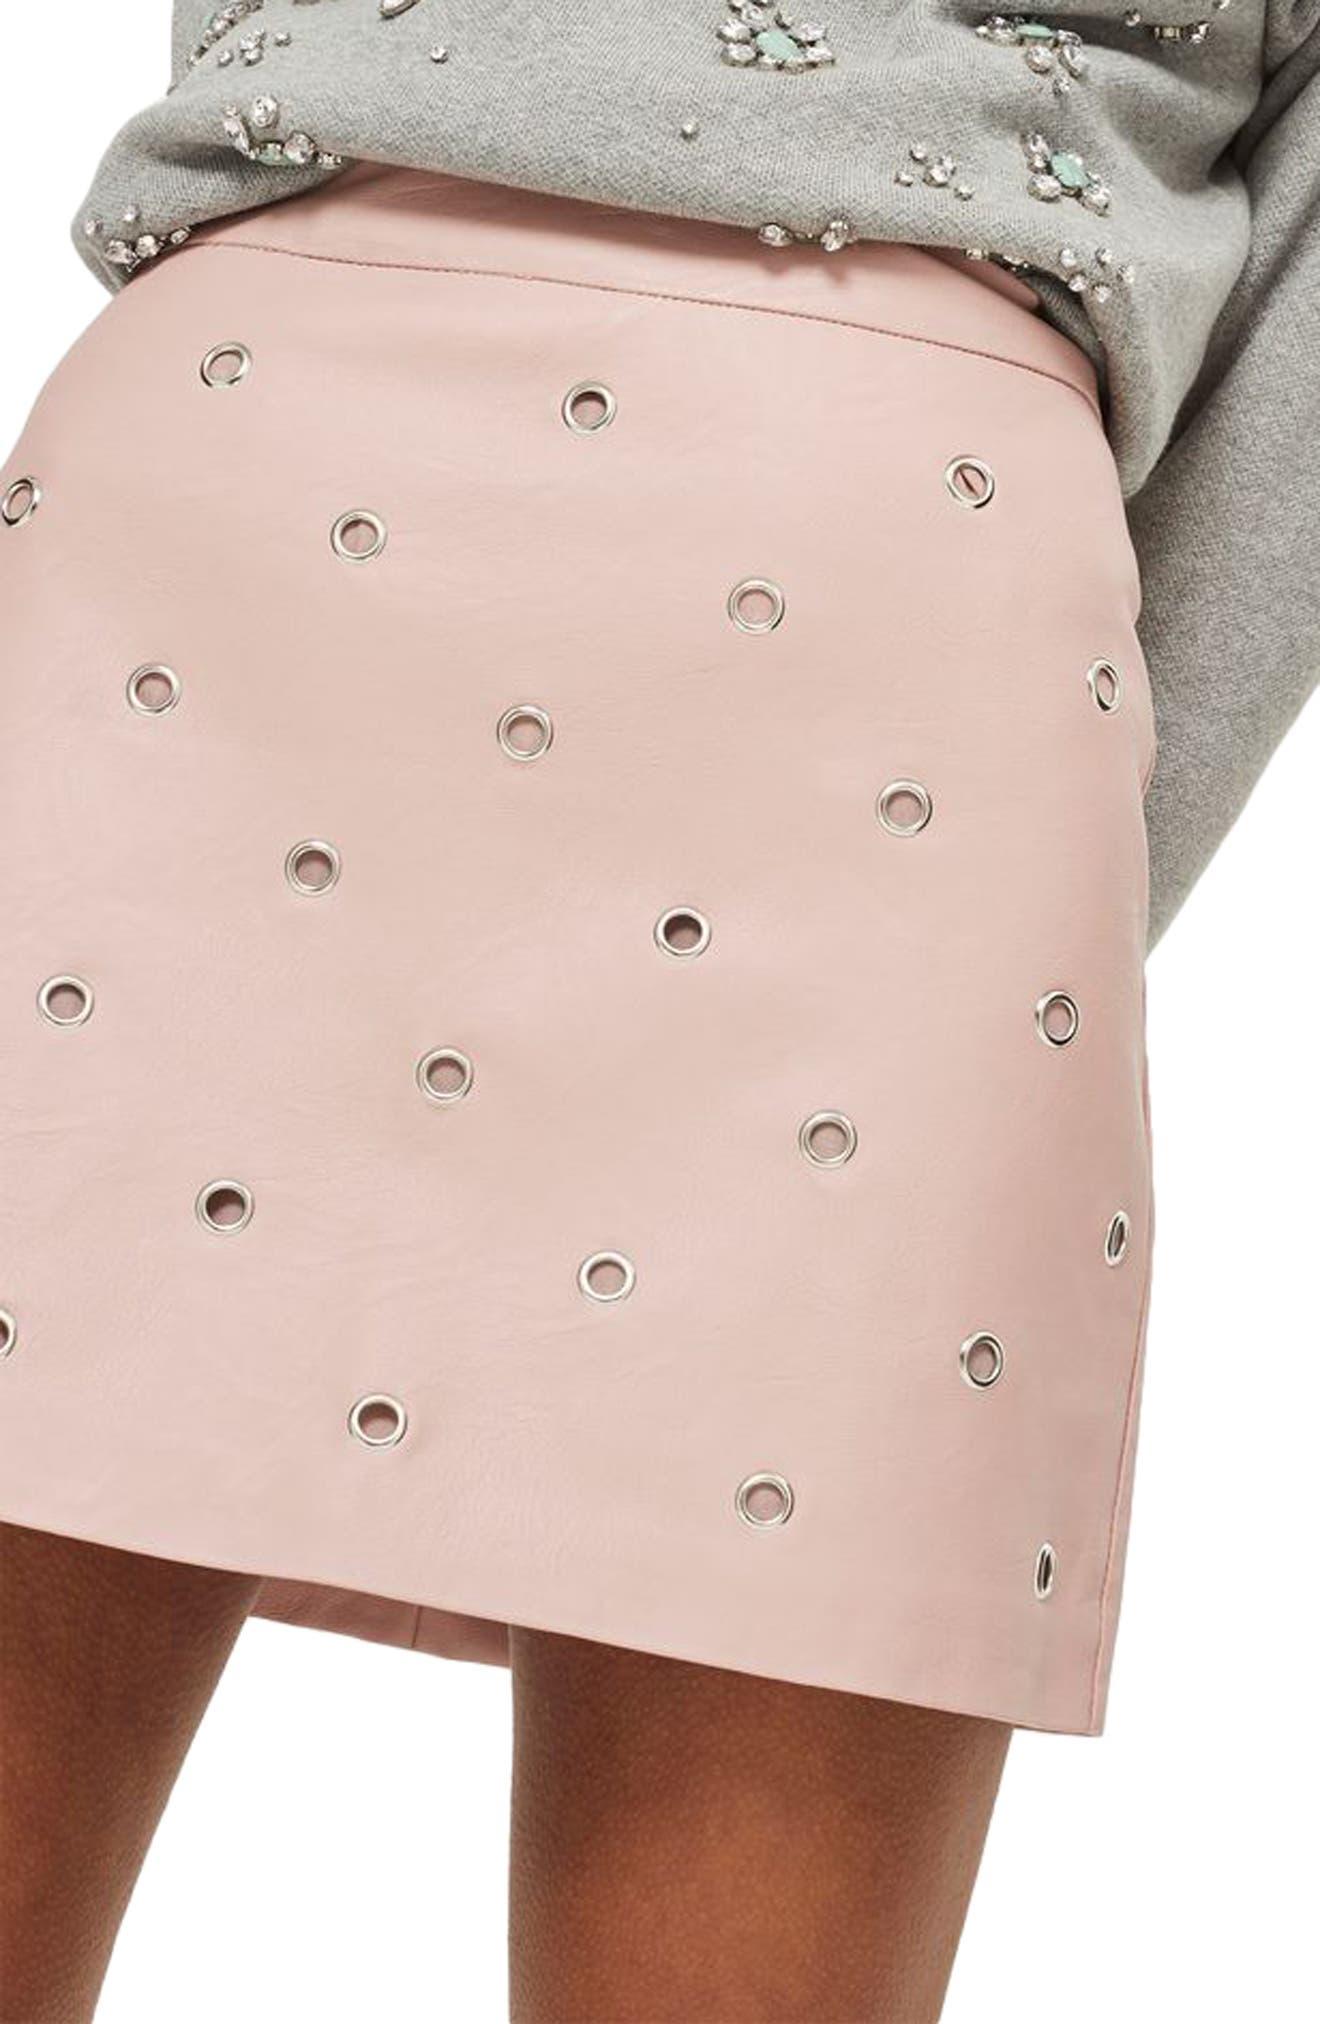 Topshop Grommet Faux Leather Skirt